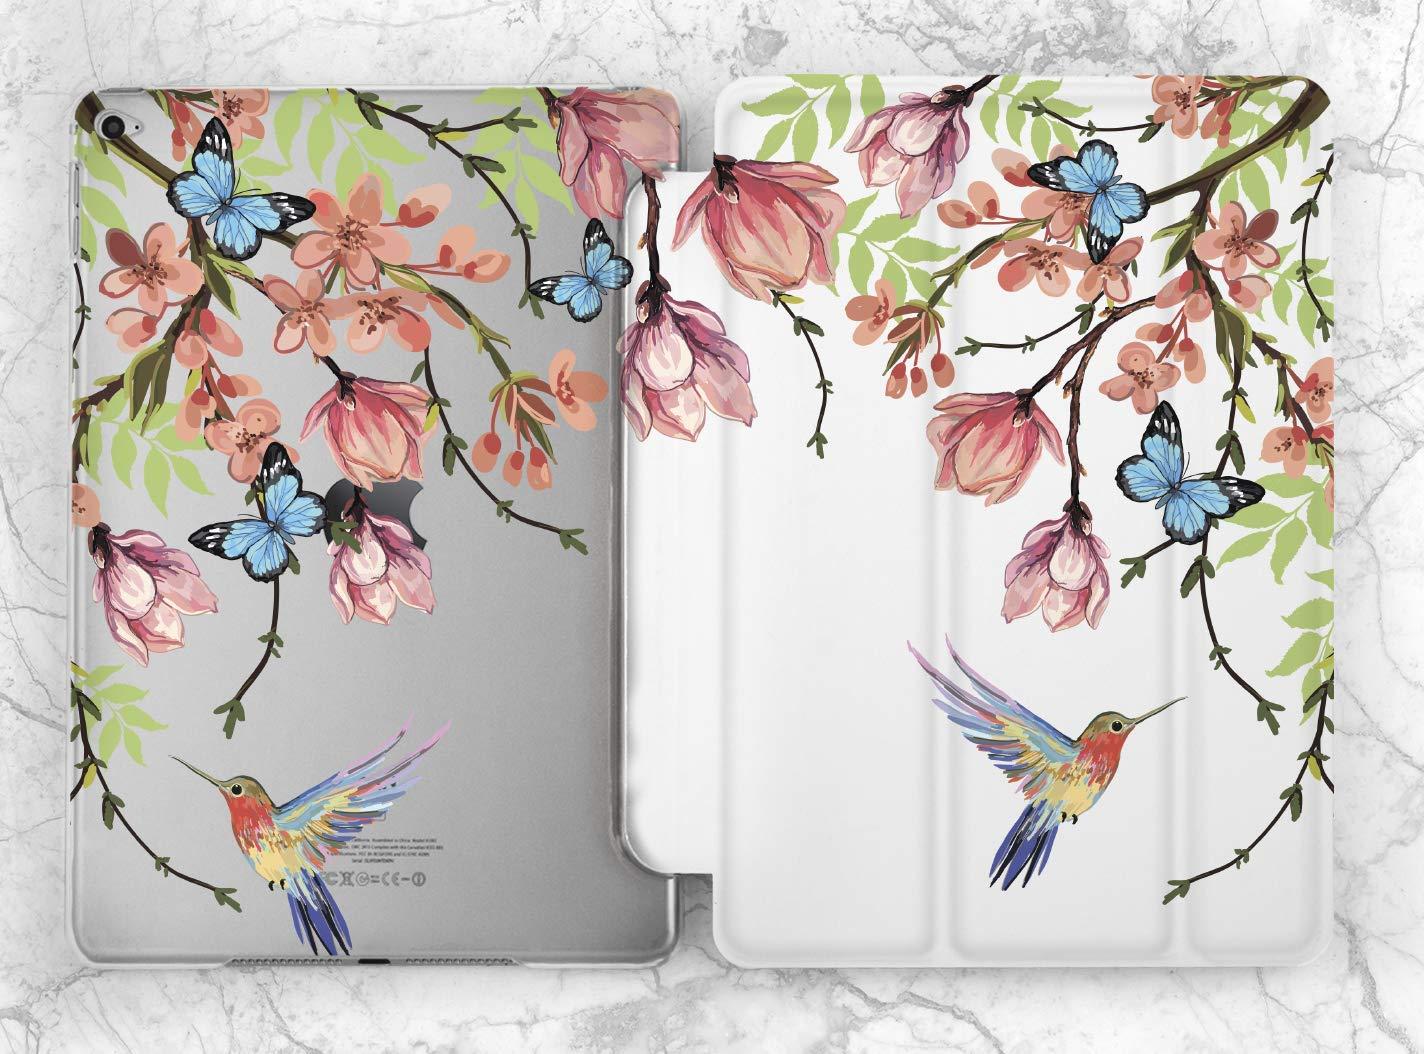 music iPad Air cover iPad Pro 9.7 inch iPad Air 2 case art hard case iPad Mini 4 case iPad Pro 12.9 inch iPad Mini 3 case iPad case